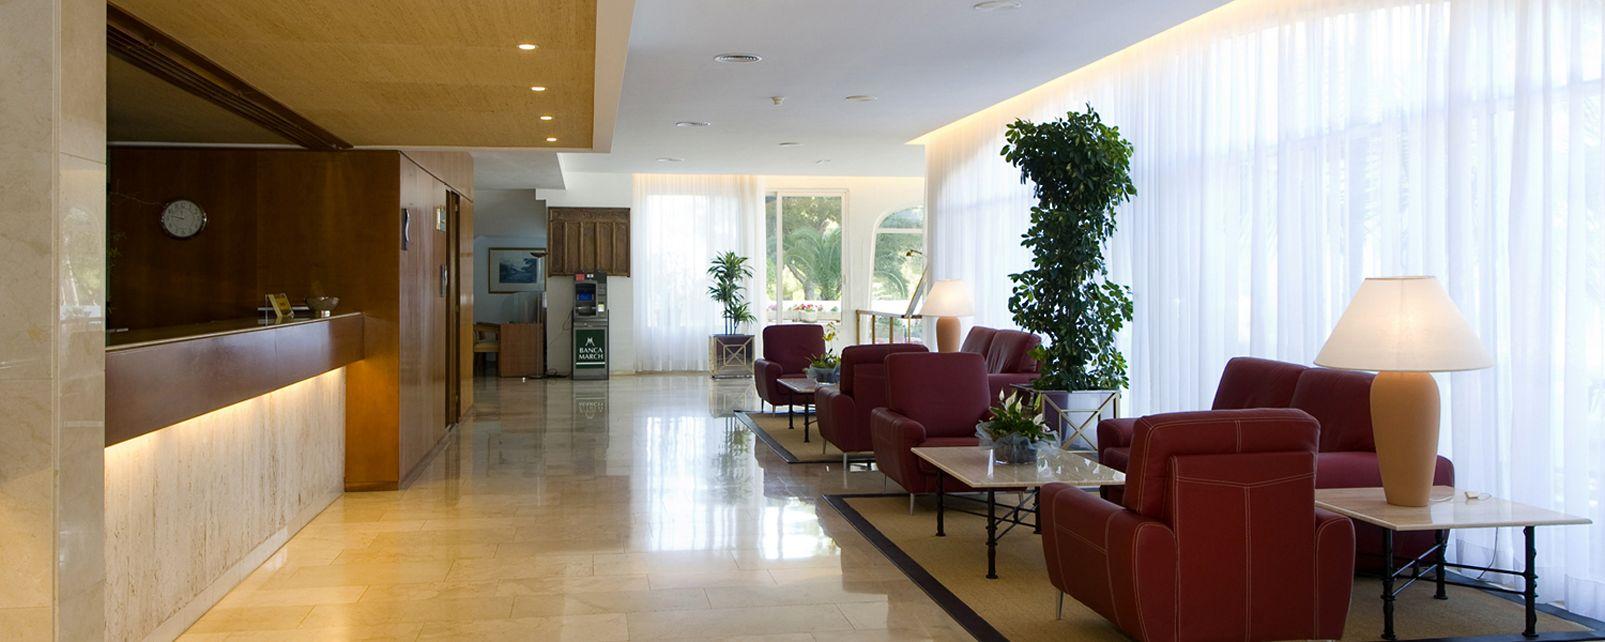 Hôtel Hipotels Eurotel Punta Rotja